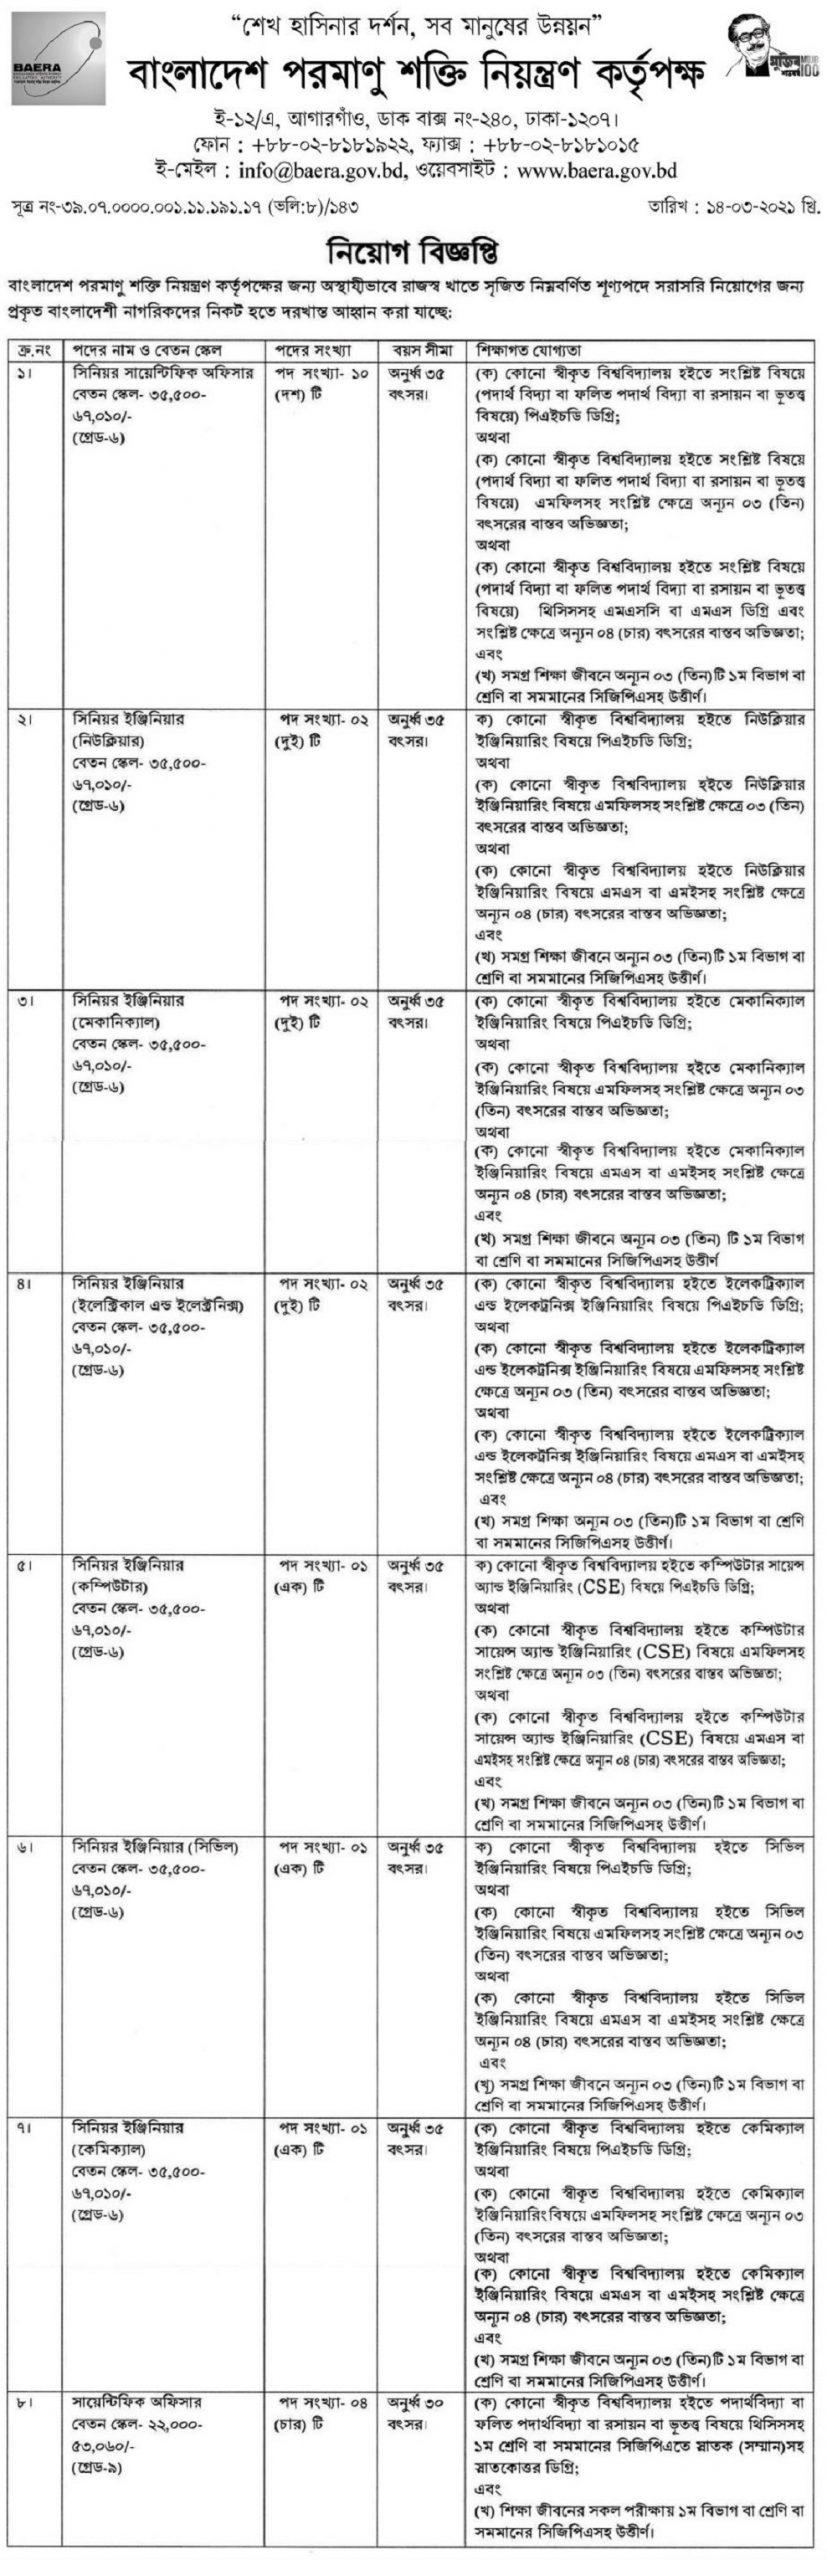 Bangladesh Atomic Energy Commission Job Circular April 2021